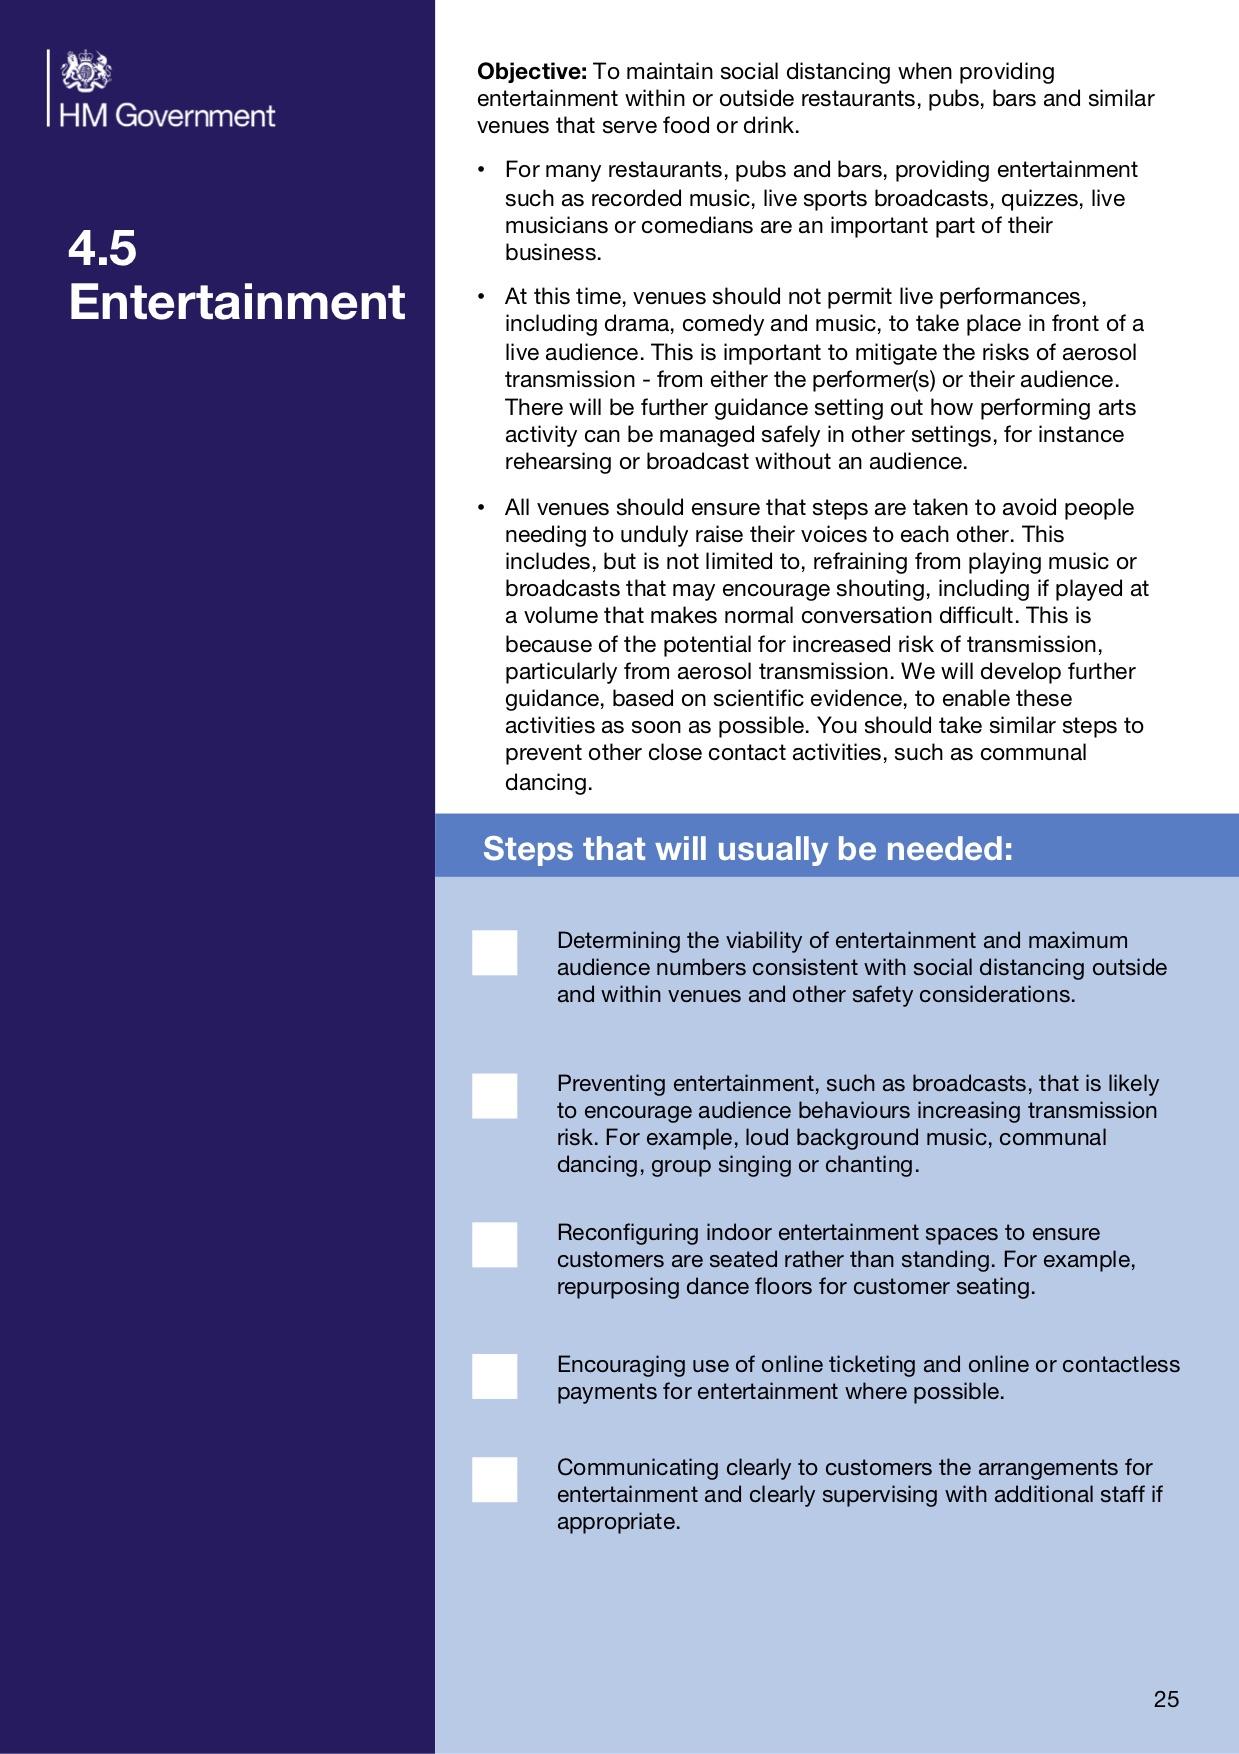 HM Government Section 4.5 Entertainment Covid-19 Coronavirus